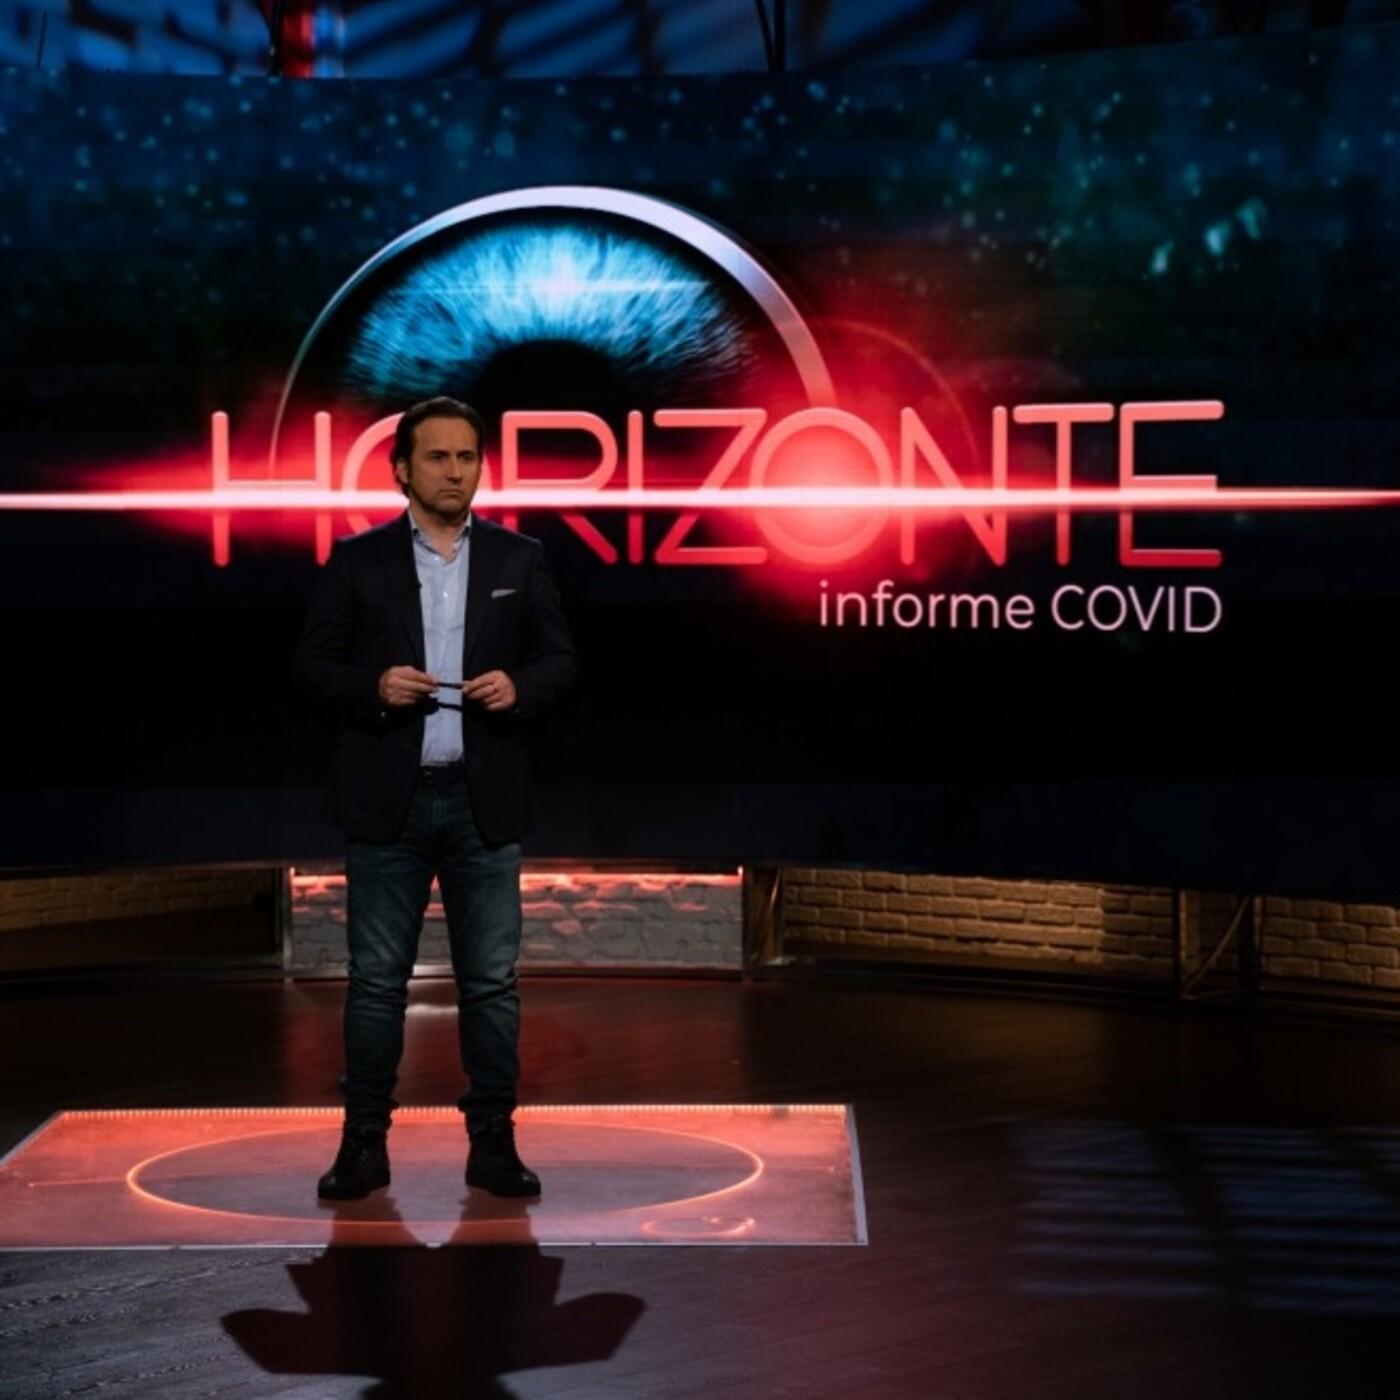 Especial Horizonte: Informe Covid T2x01 (07-01-2021) La temida tercera ola